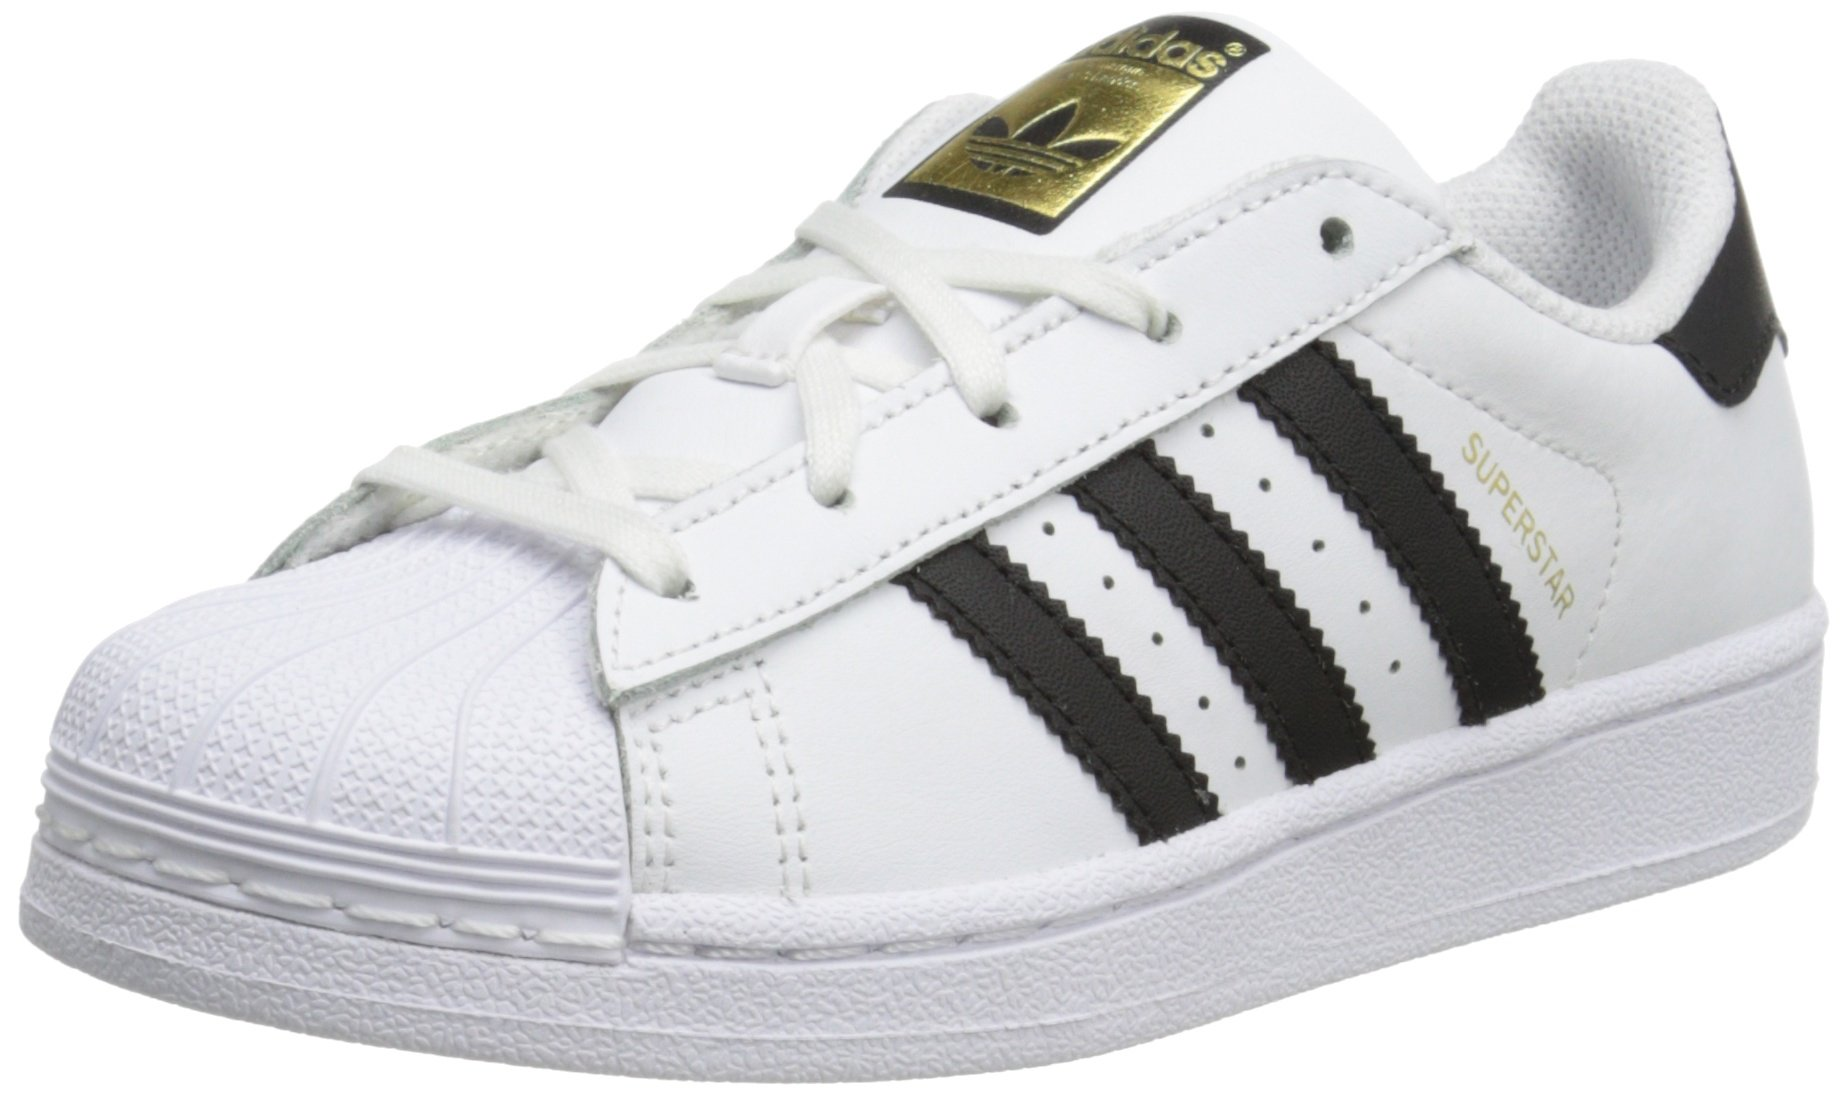 galleon adidas originals superstar c basketball shoe. Black Bedroom Furniture Sets. Home Design Ideas